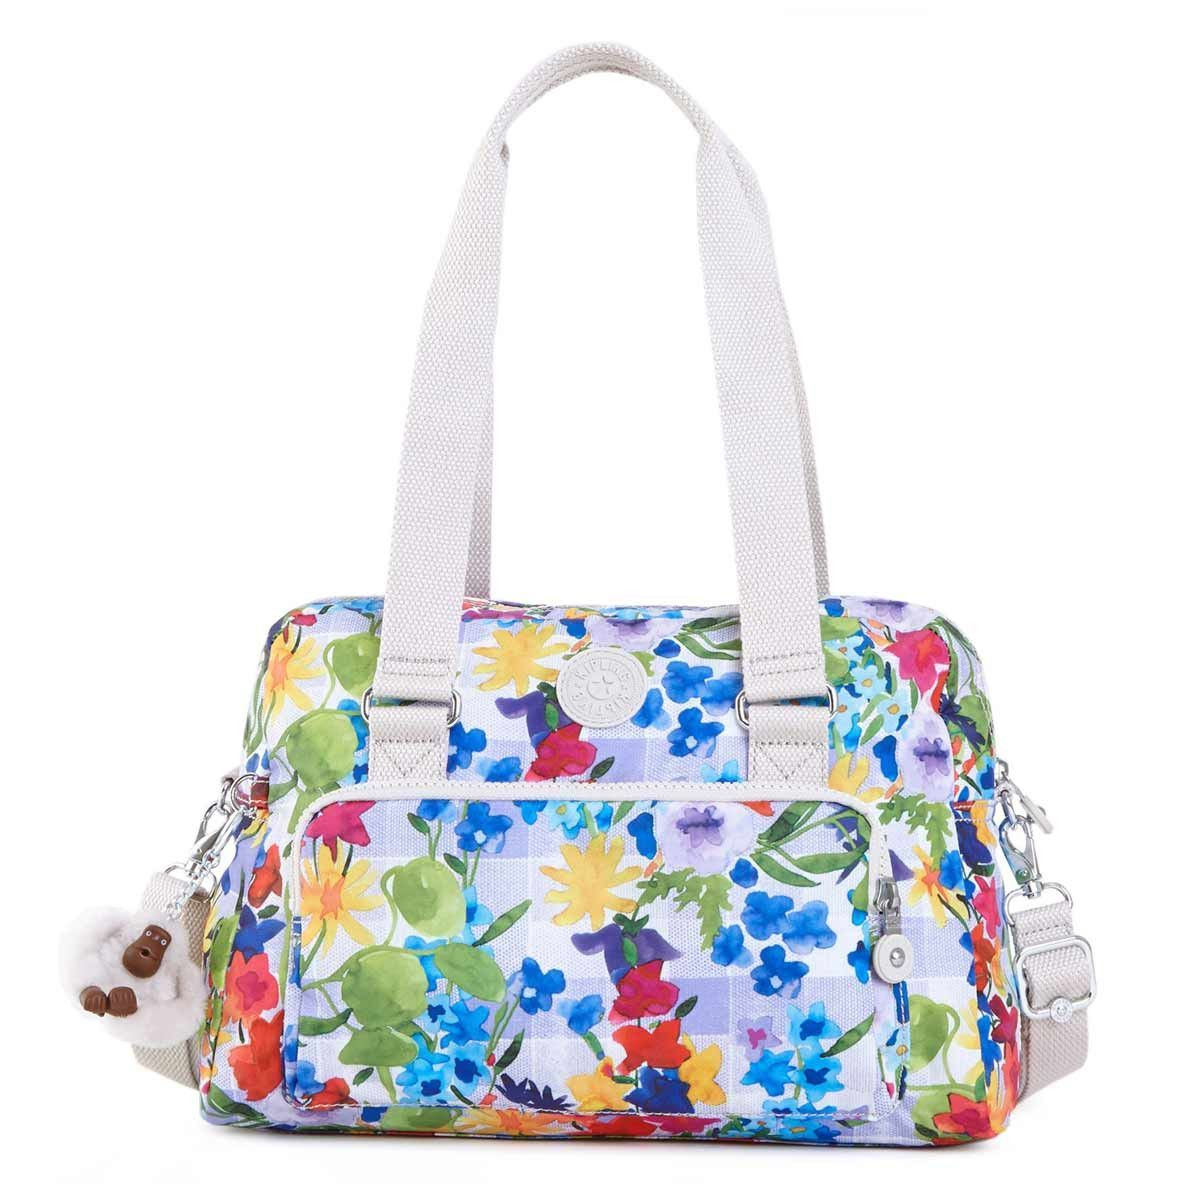 da4a06e0777 Kipling HB6613-943 Women's Dania Picnic in the Park Printed Polyester  Handbag